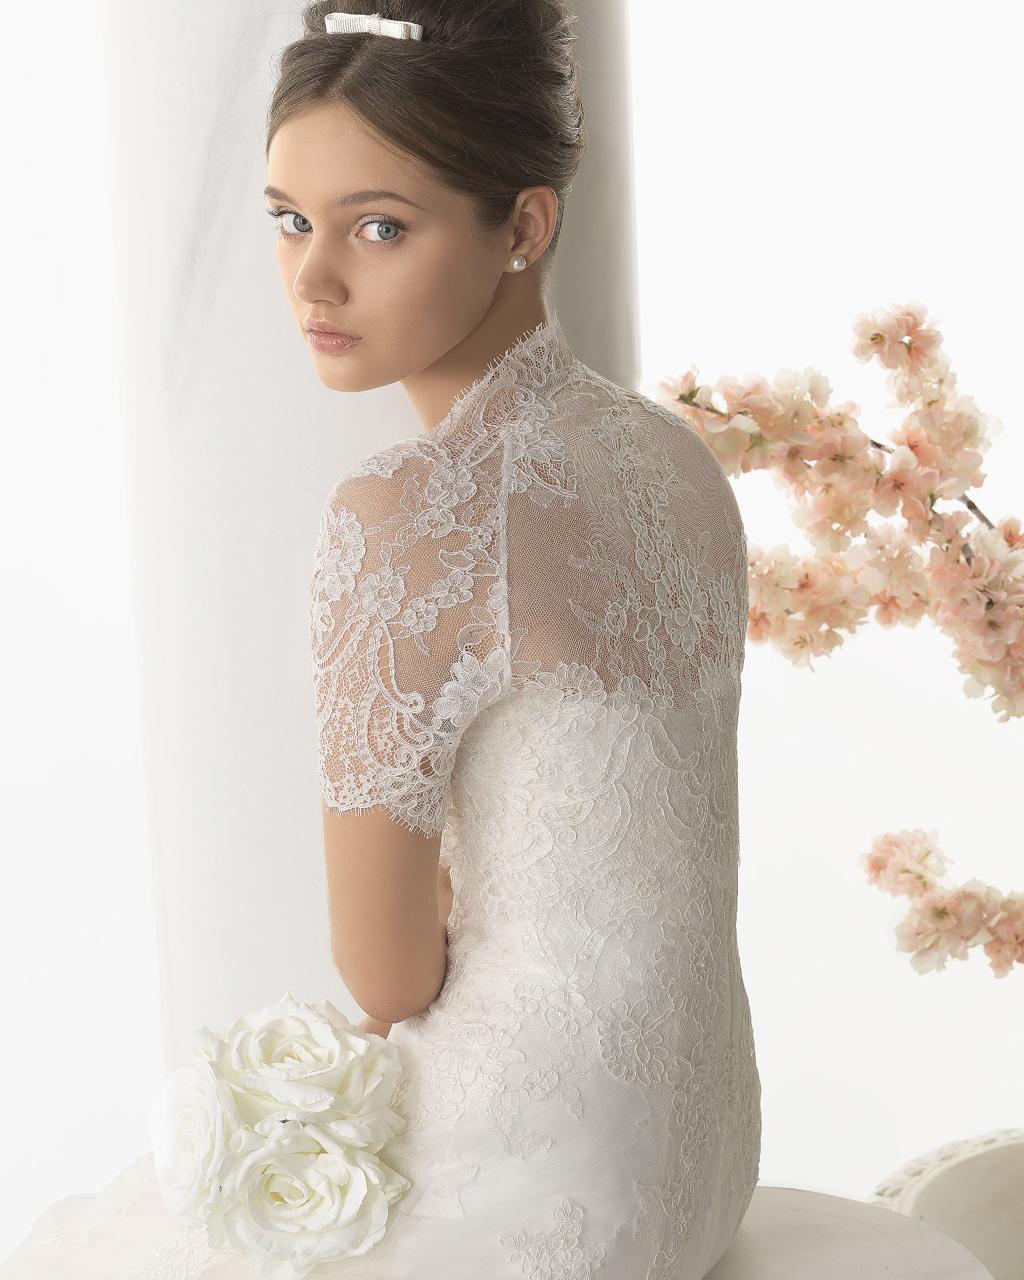 Simple Wedding Dress Hong Kong: Simply Love Wedding - Designer Wedding Gowns